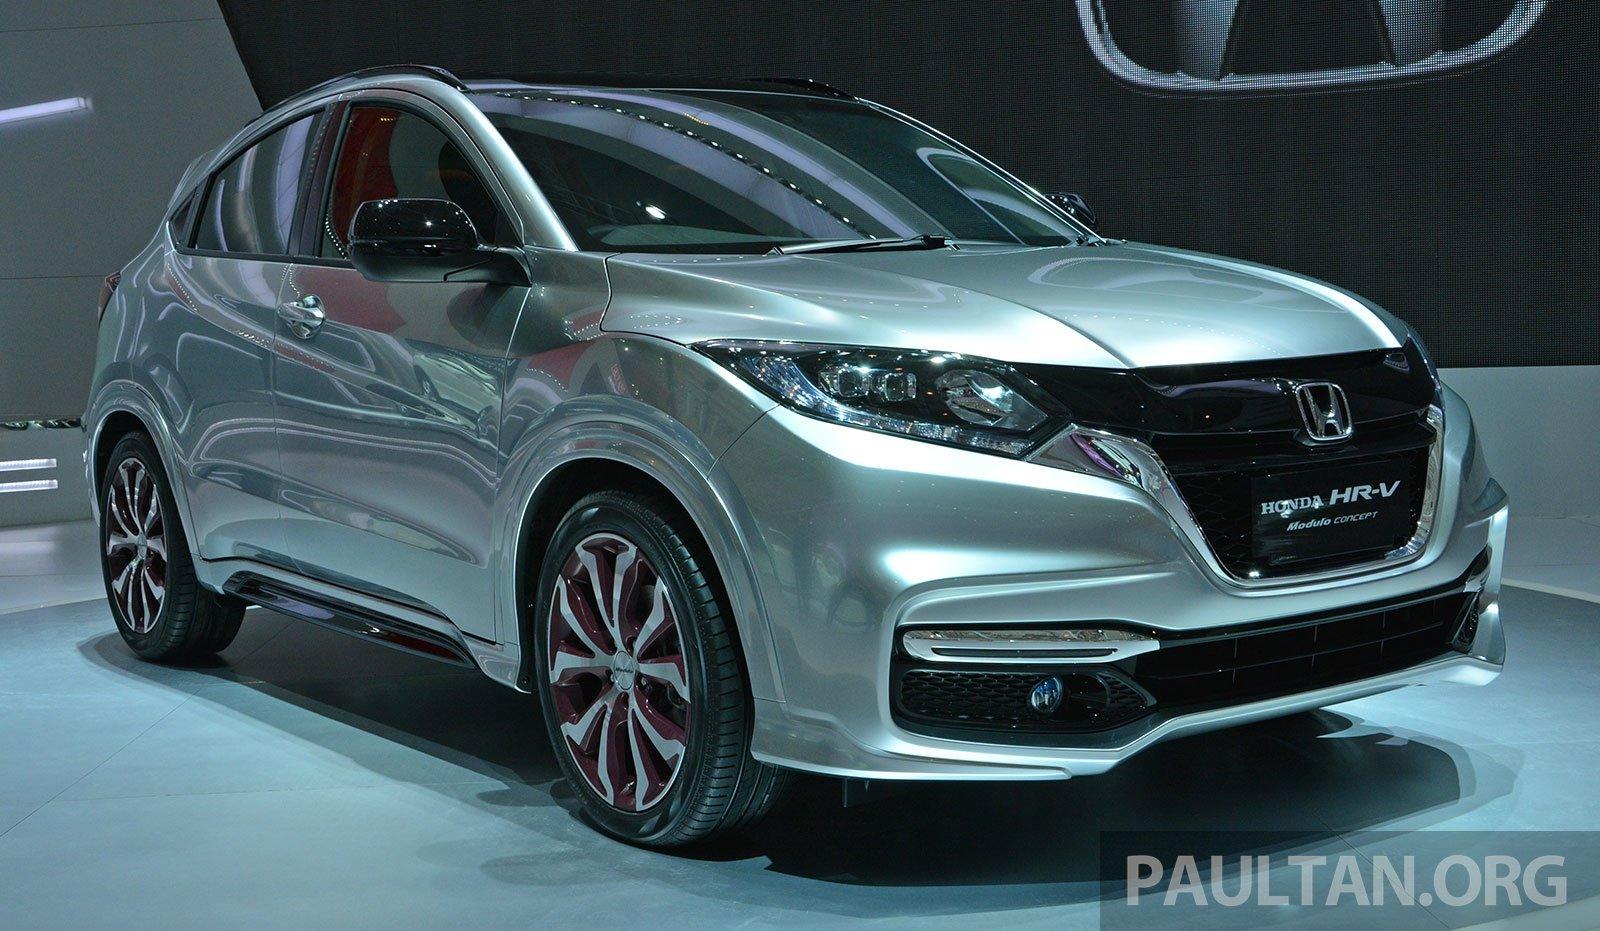 Honda Hr V Modulo >> IIMS 2014: Honda HR-V Mugen and Modulo live gallery Paul Tan - Image 273139